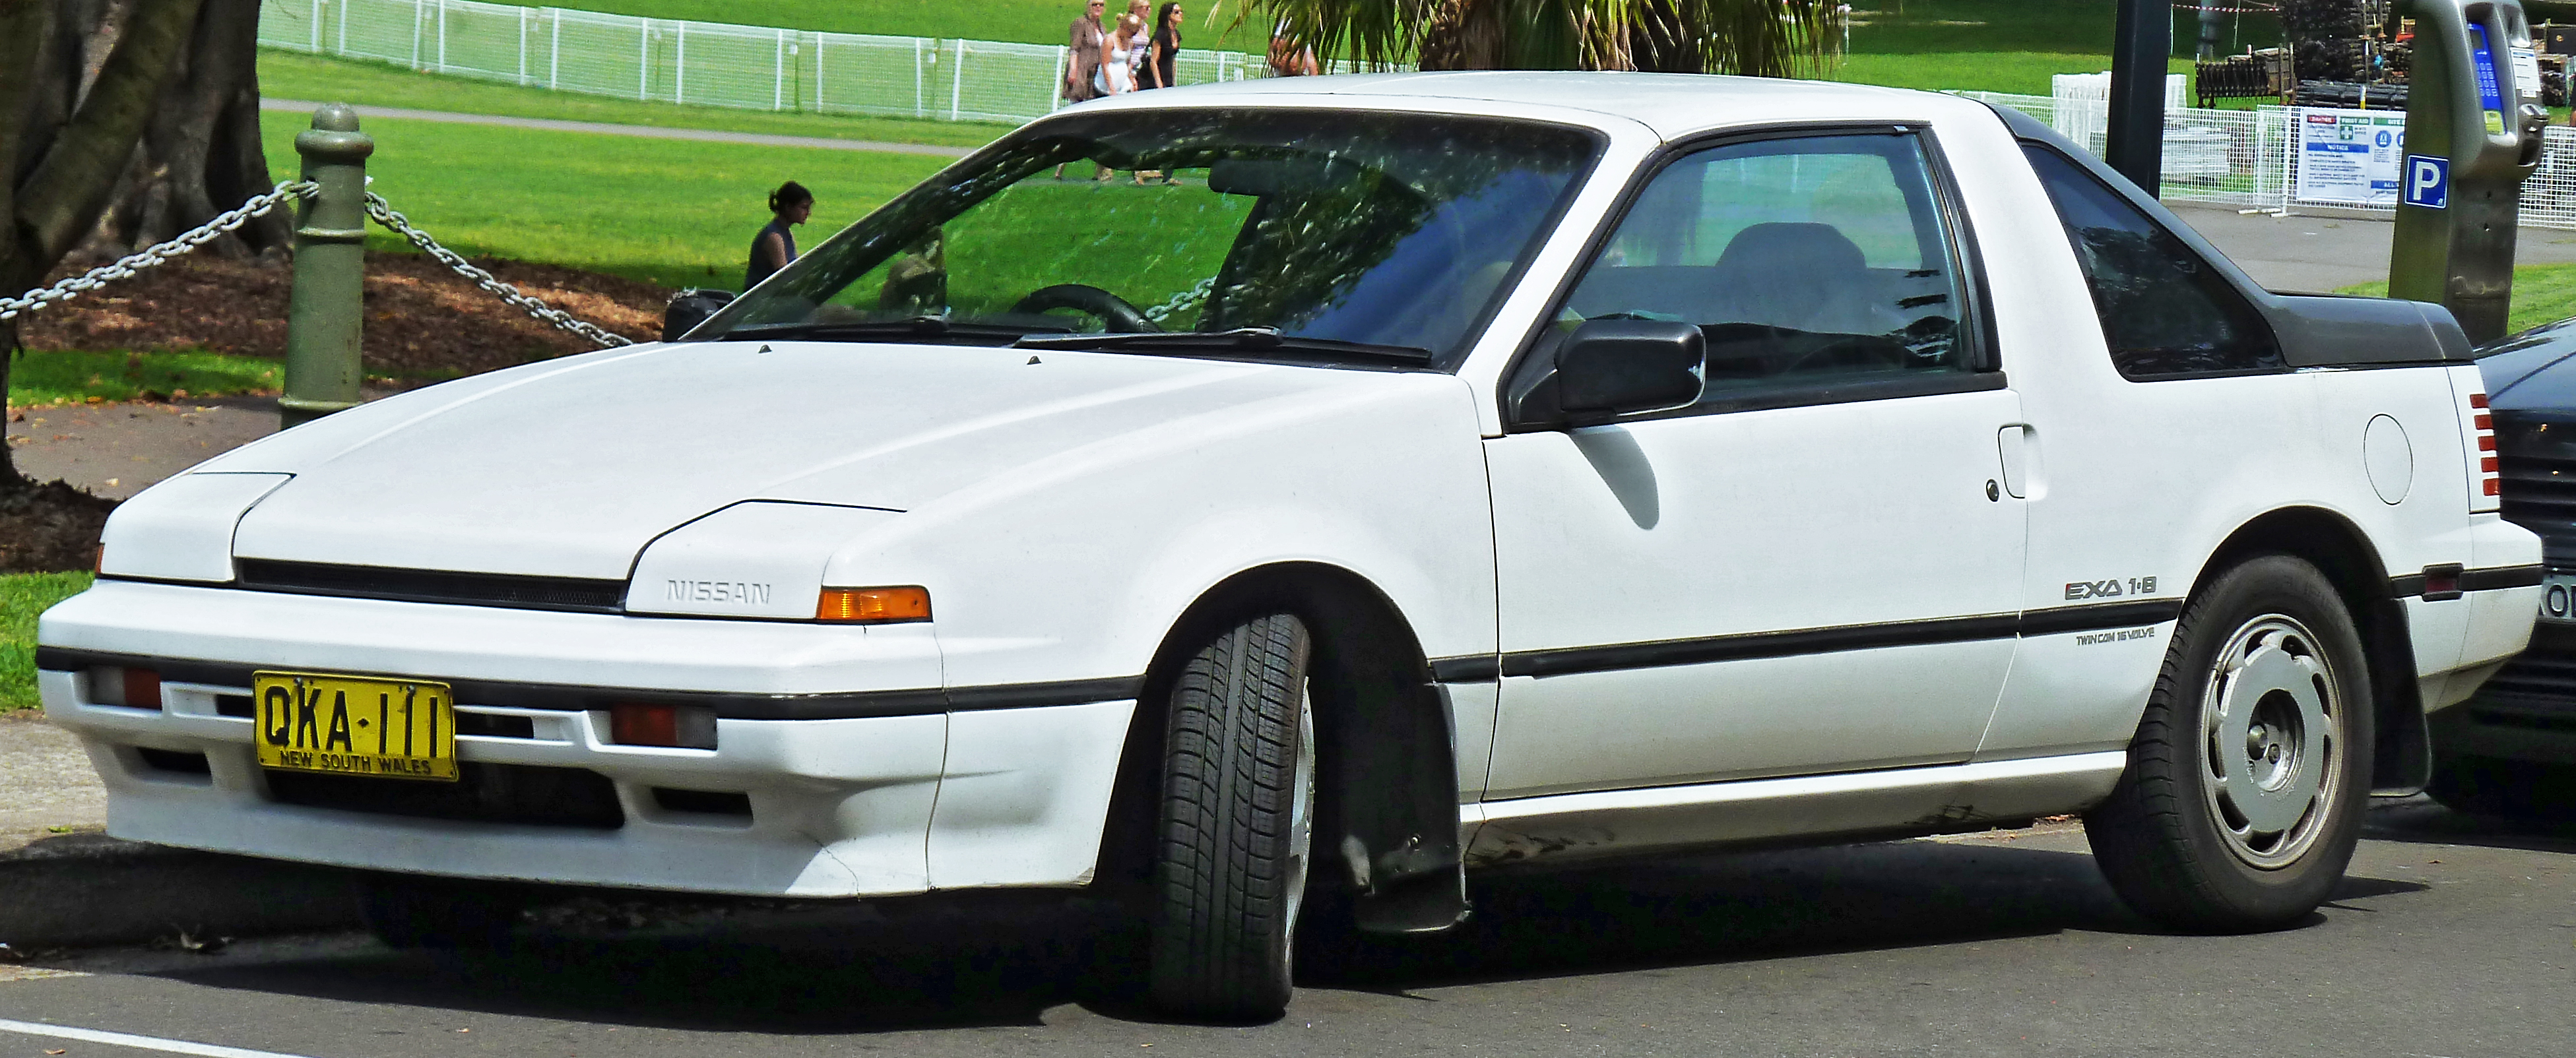 1988-1991_Nissan_EXA_%28N13%29_coupe_%28